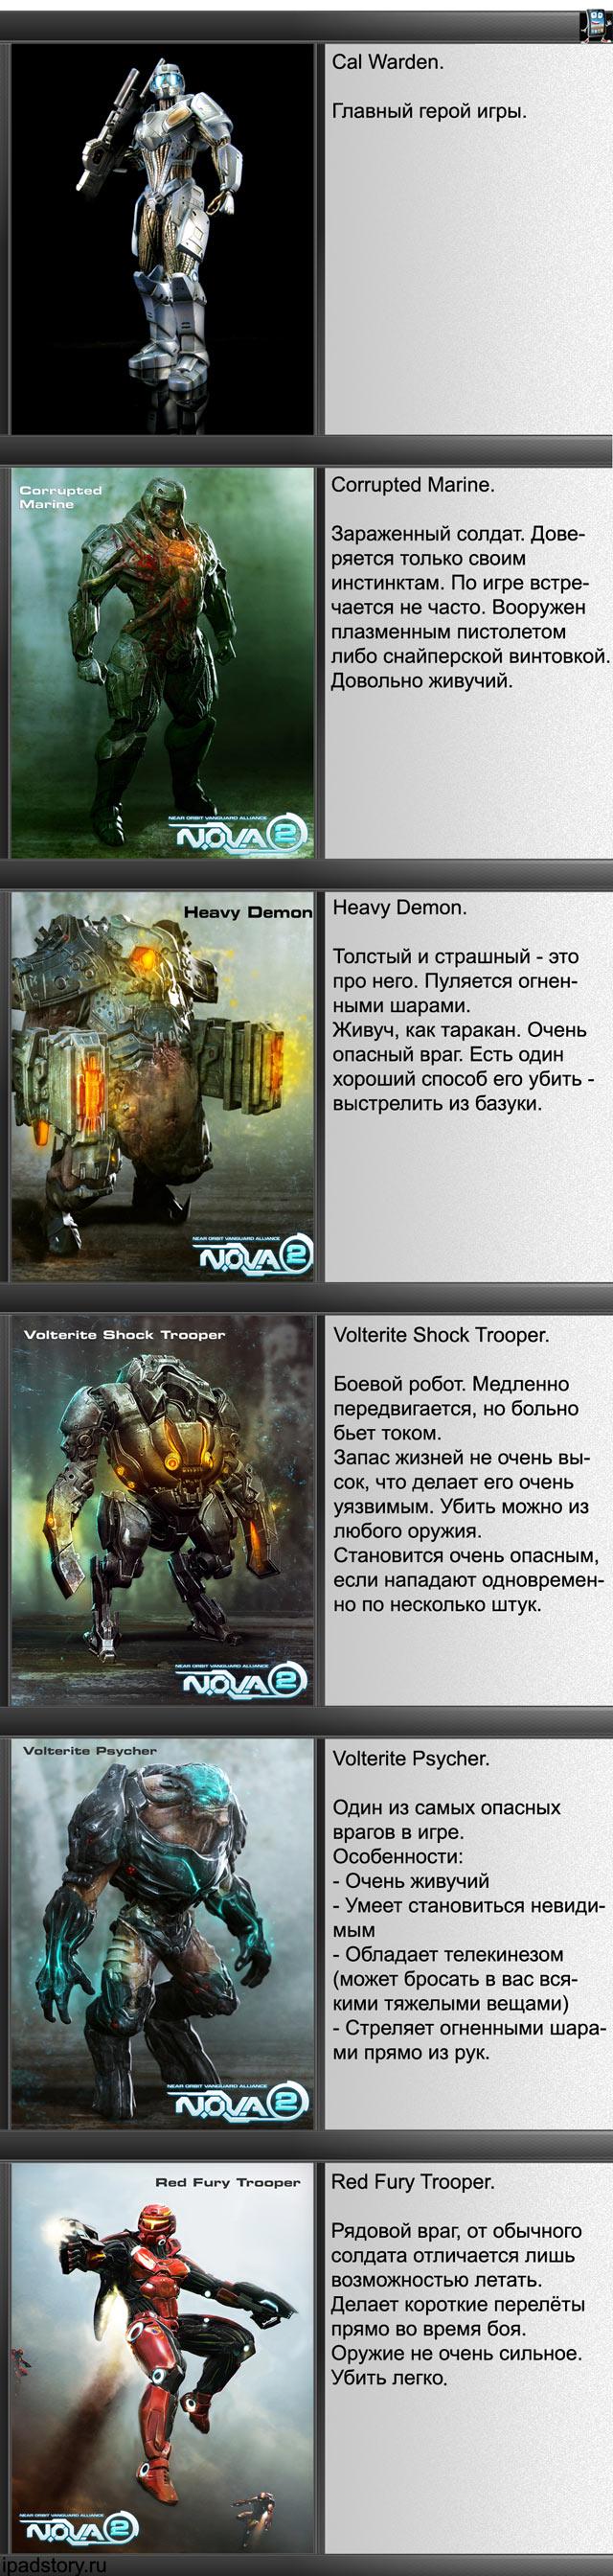 N.O.V.A. 2 - Near Orbit Vanguard Alliance HD - виды врагов, шпаргалка для игроков